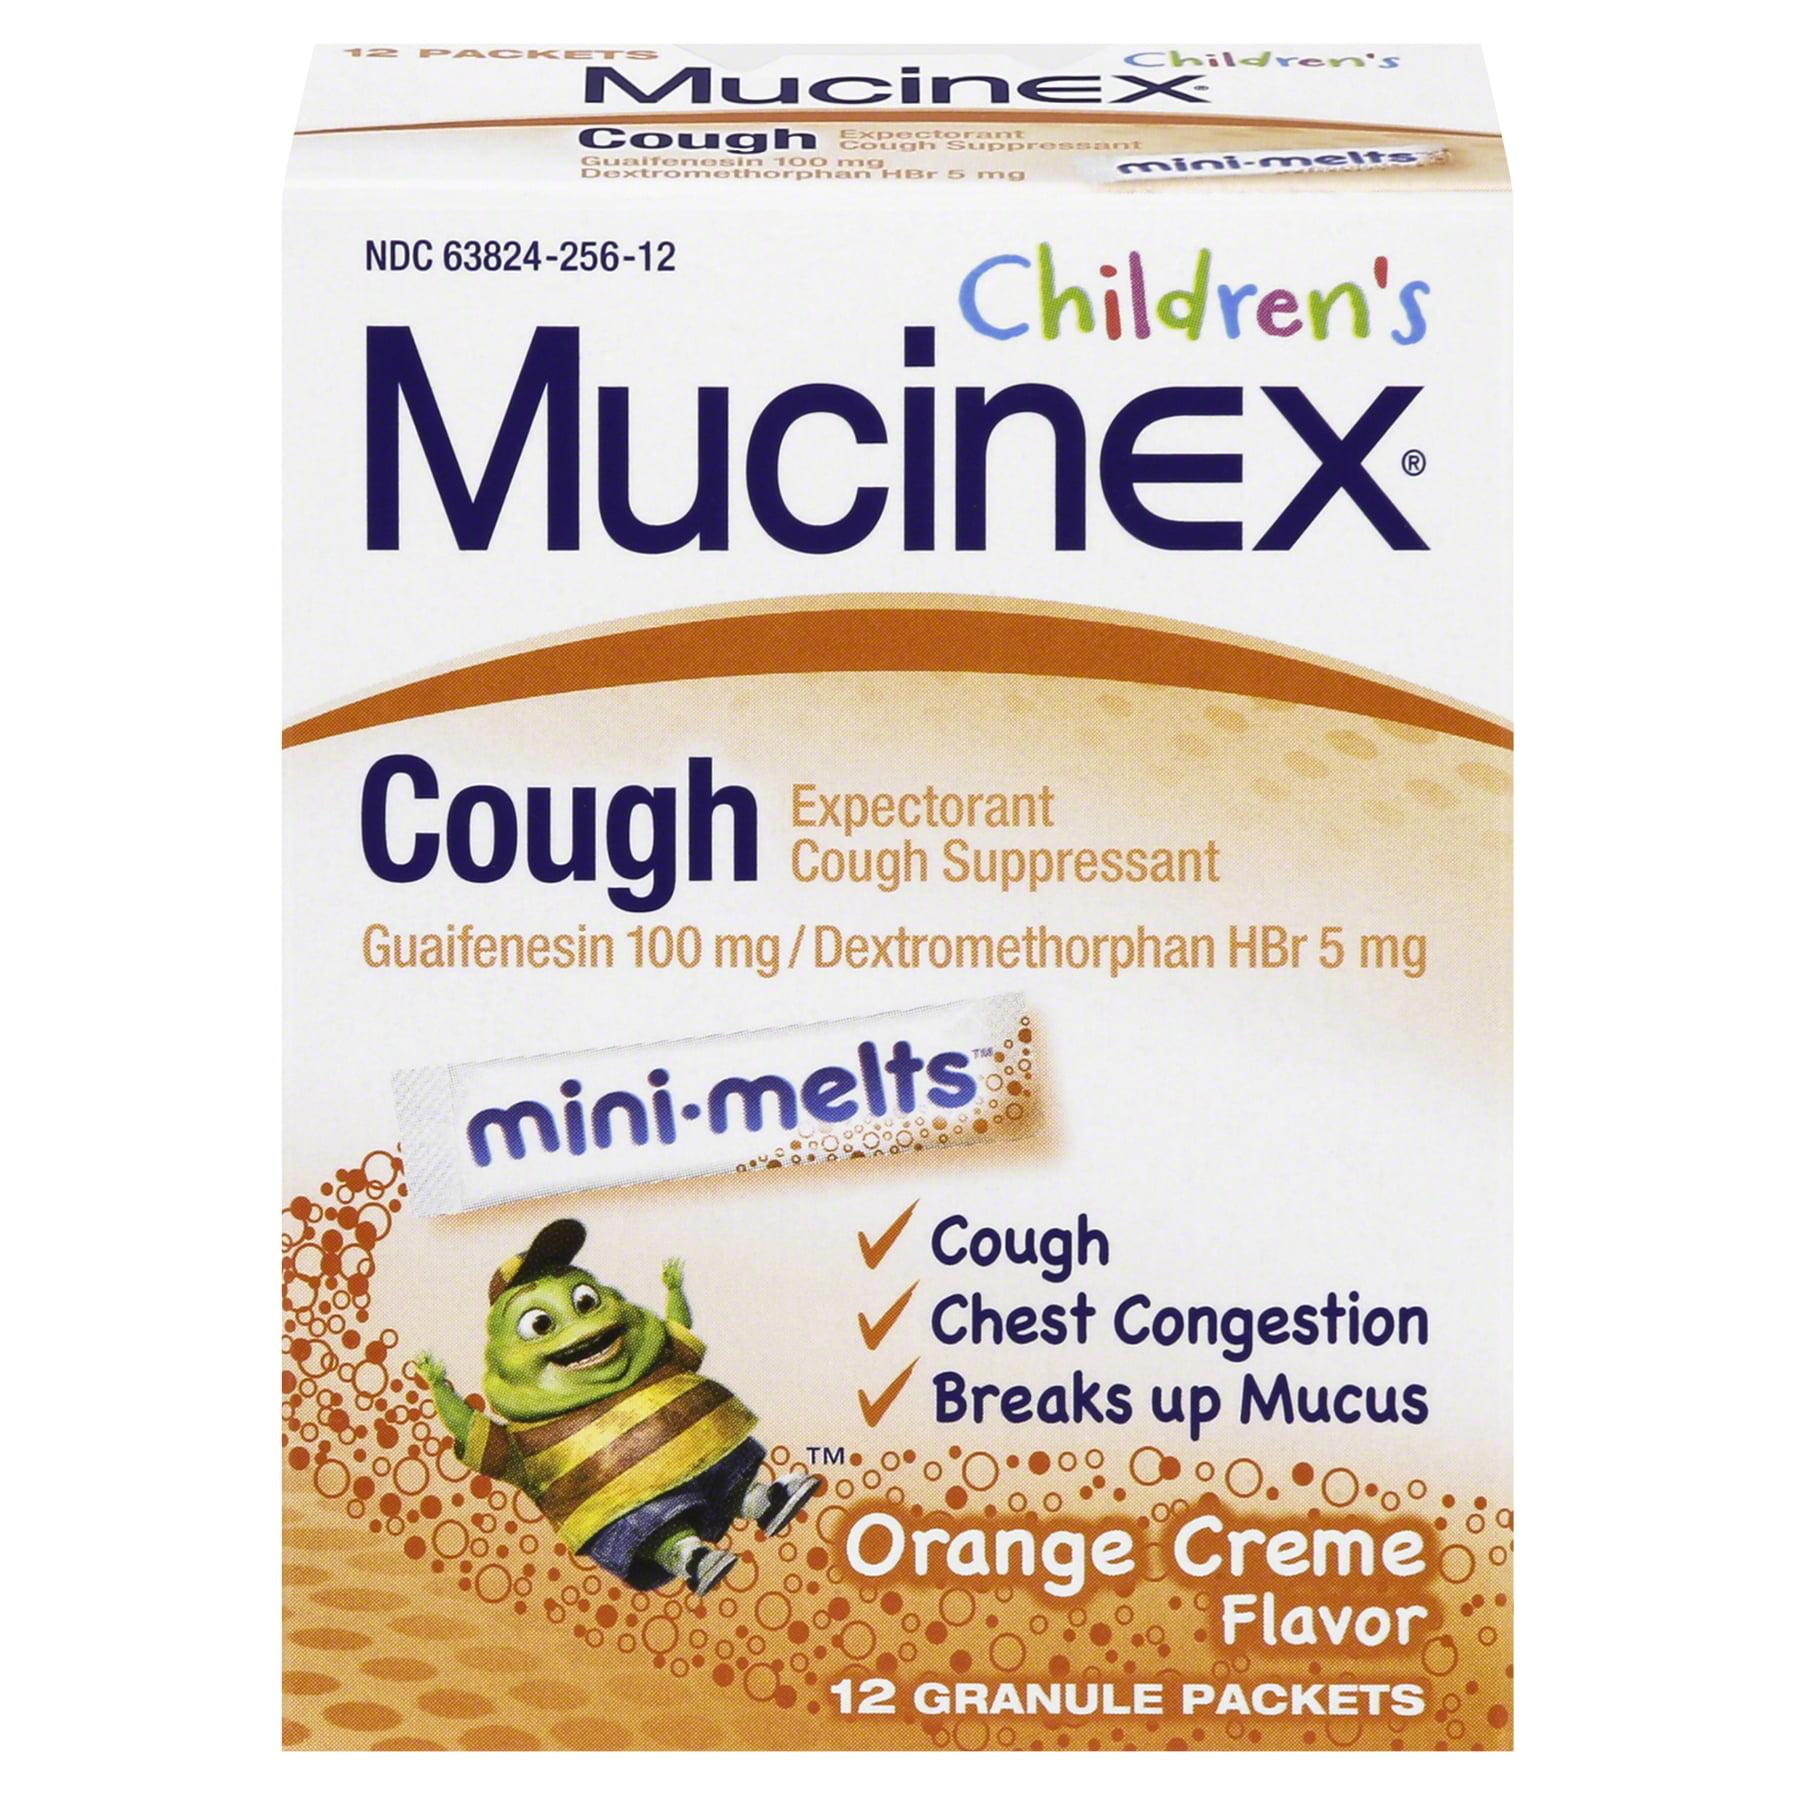 Mucinex Childrens Mini Melts, Cough, Orange Crème, 12ct